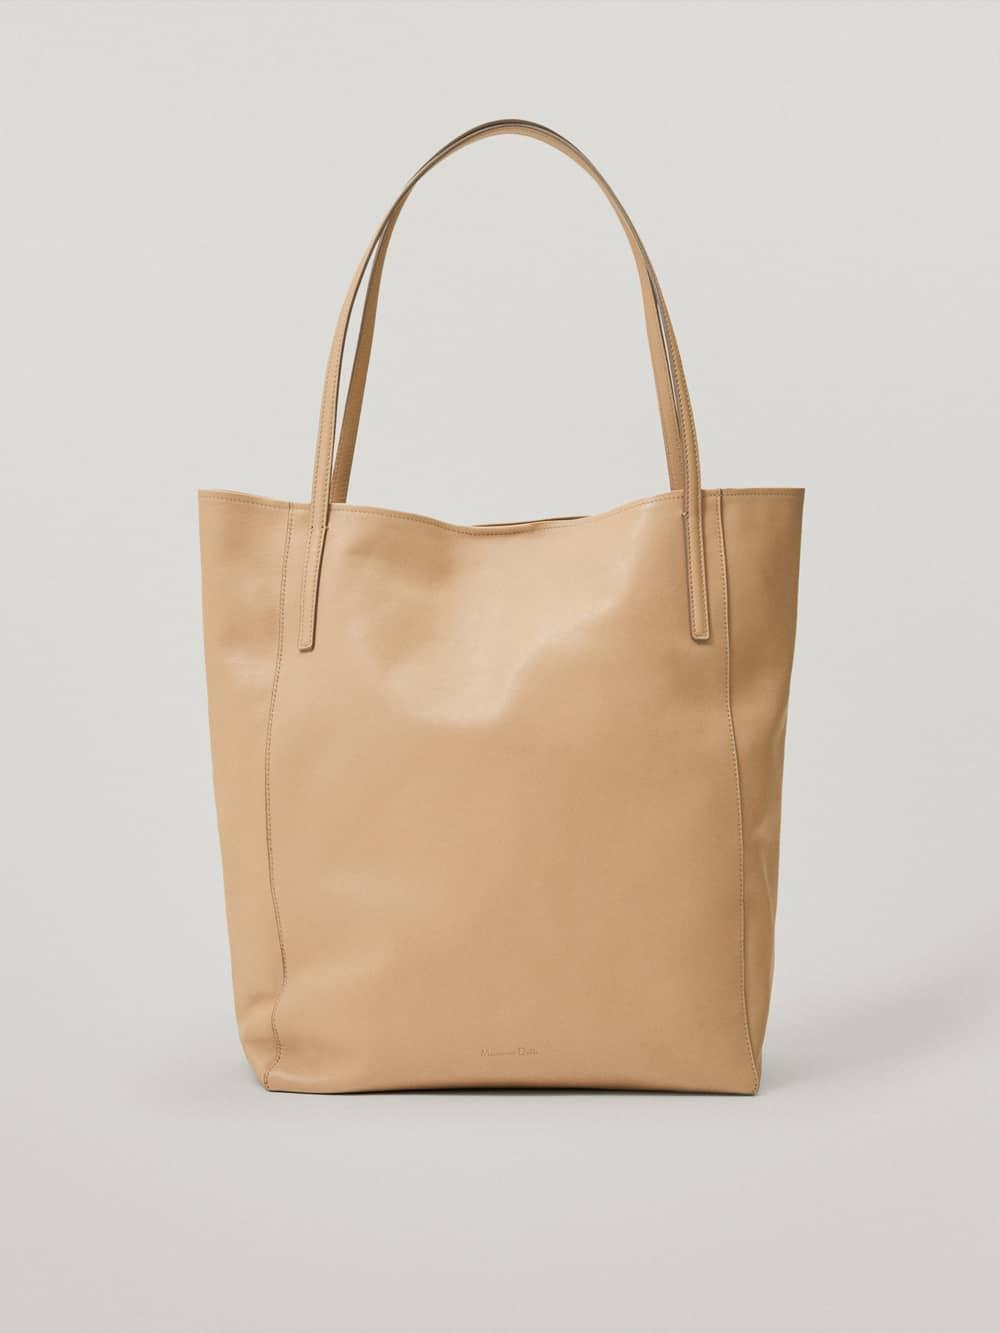 Massimo Dutti kožne torbe sniženje 2021.